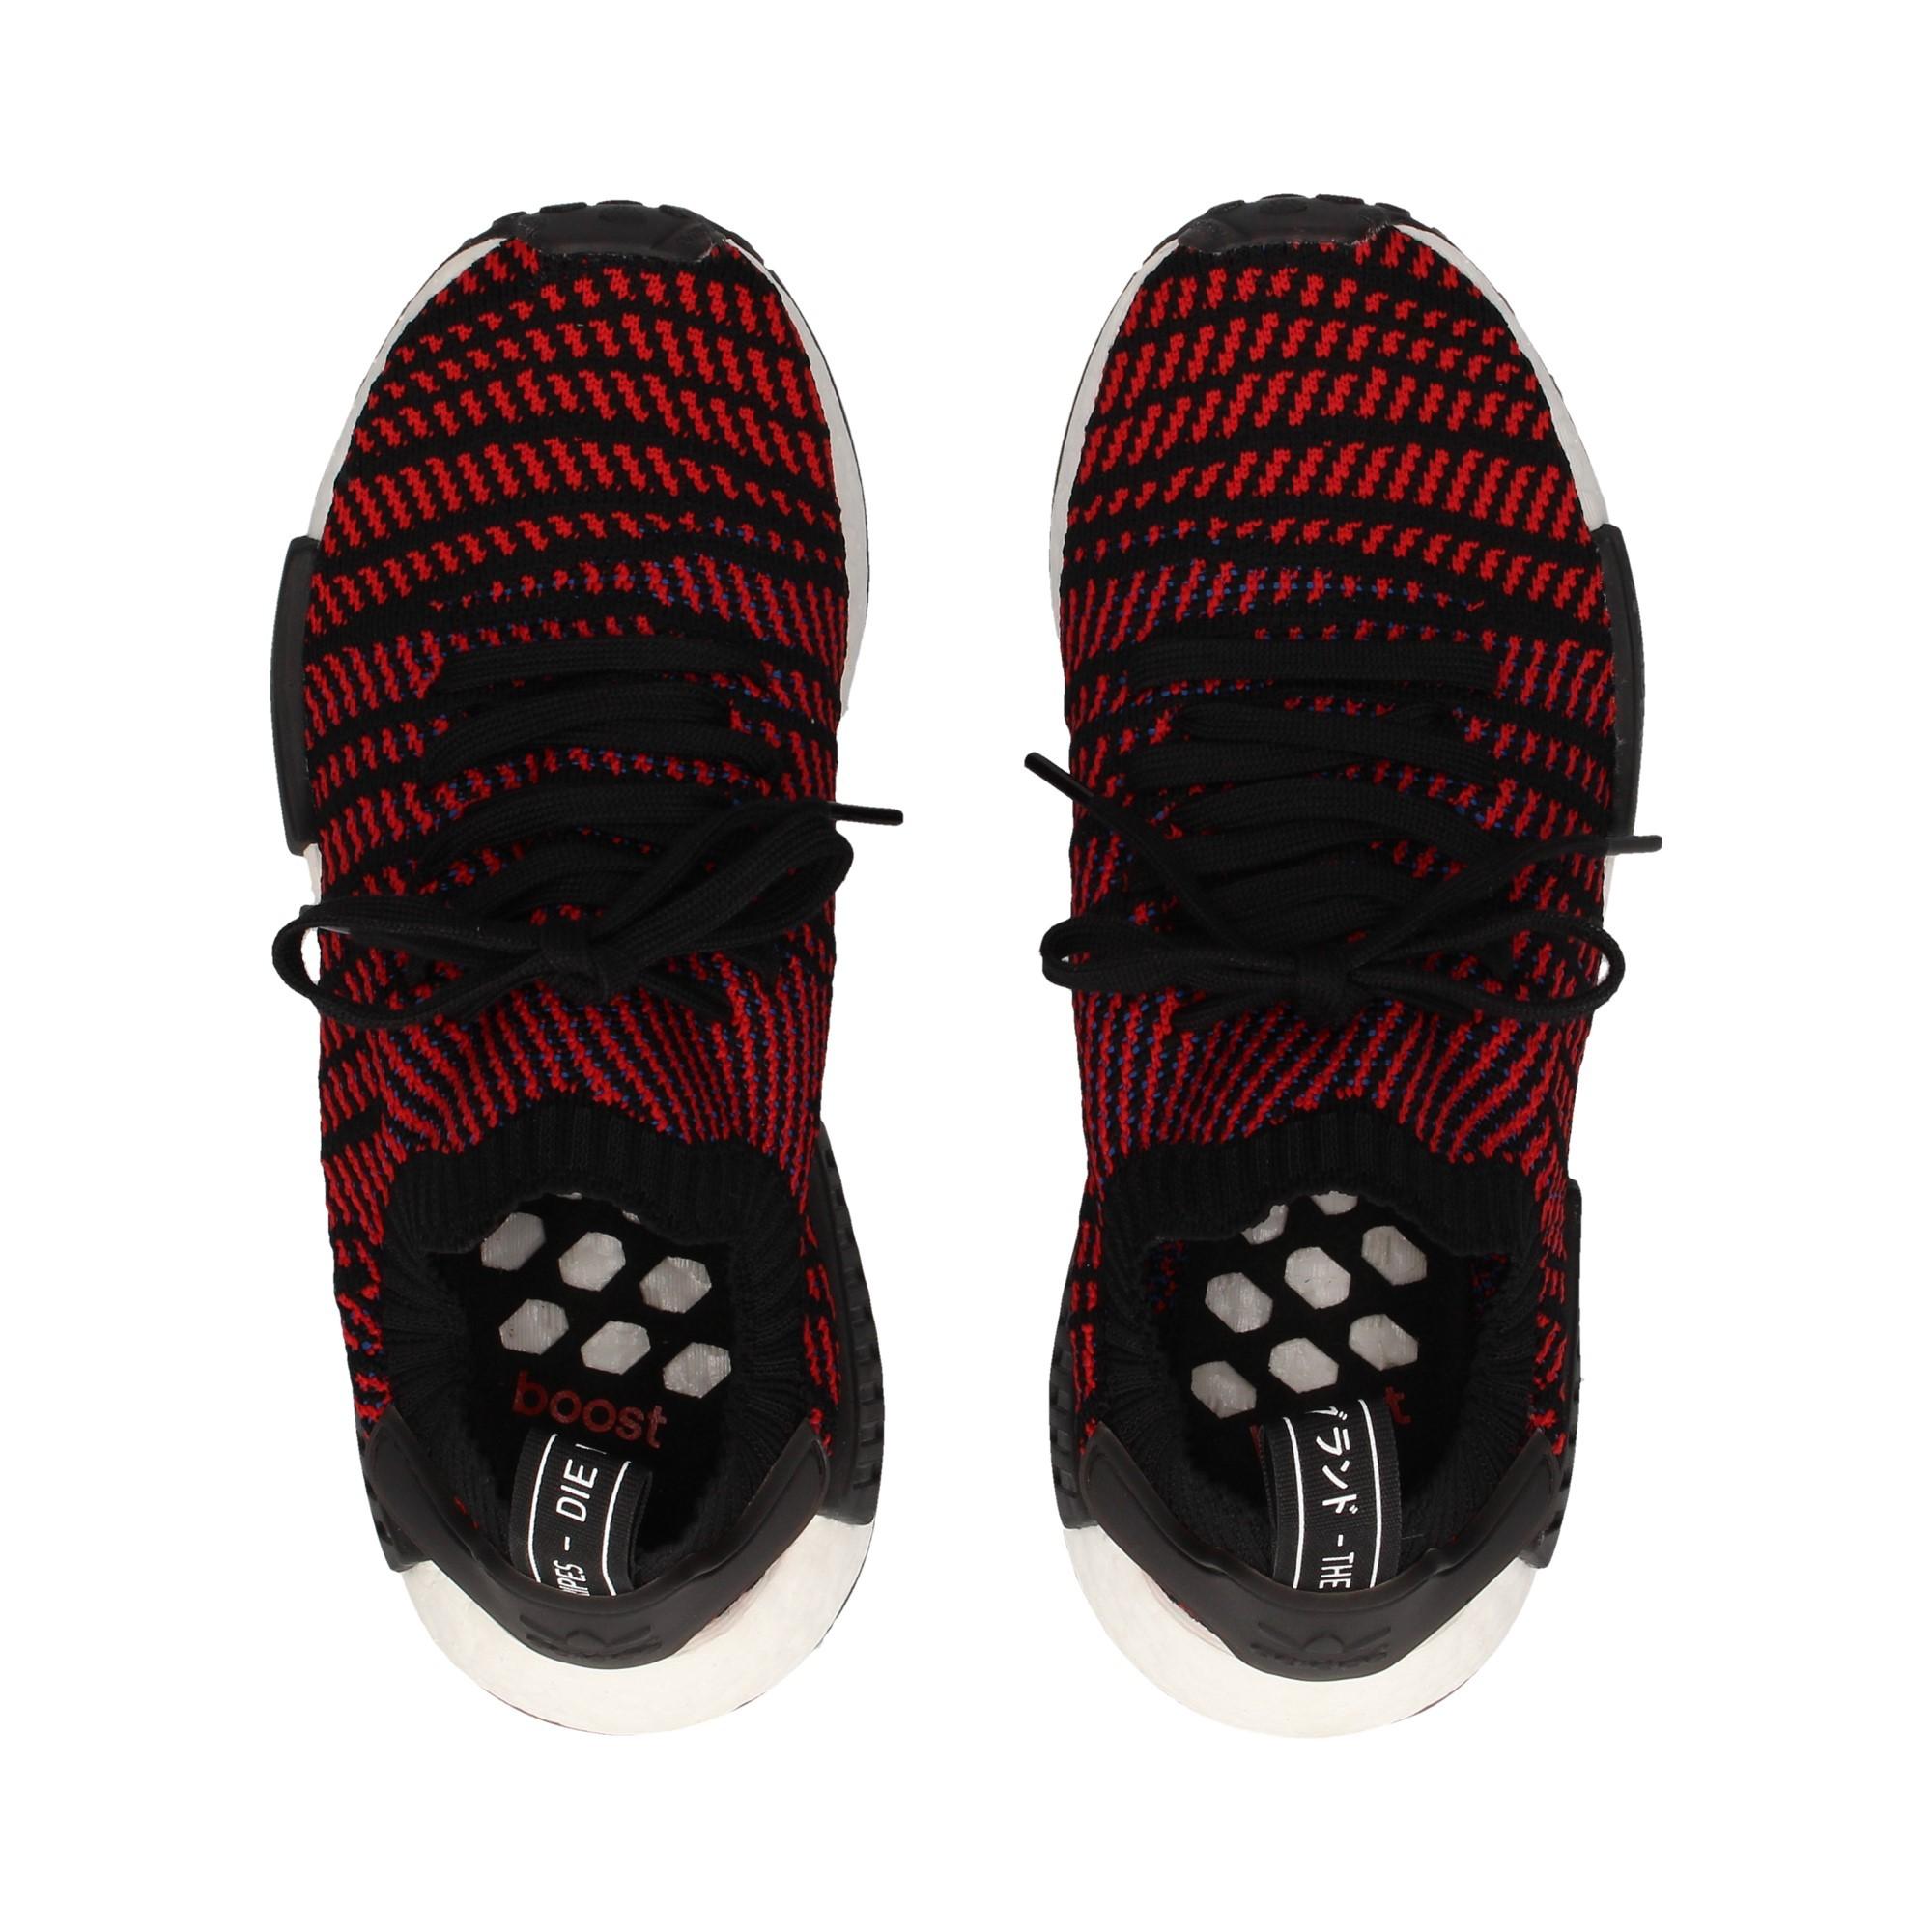 deportivo-calcetin-negro-rojo